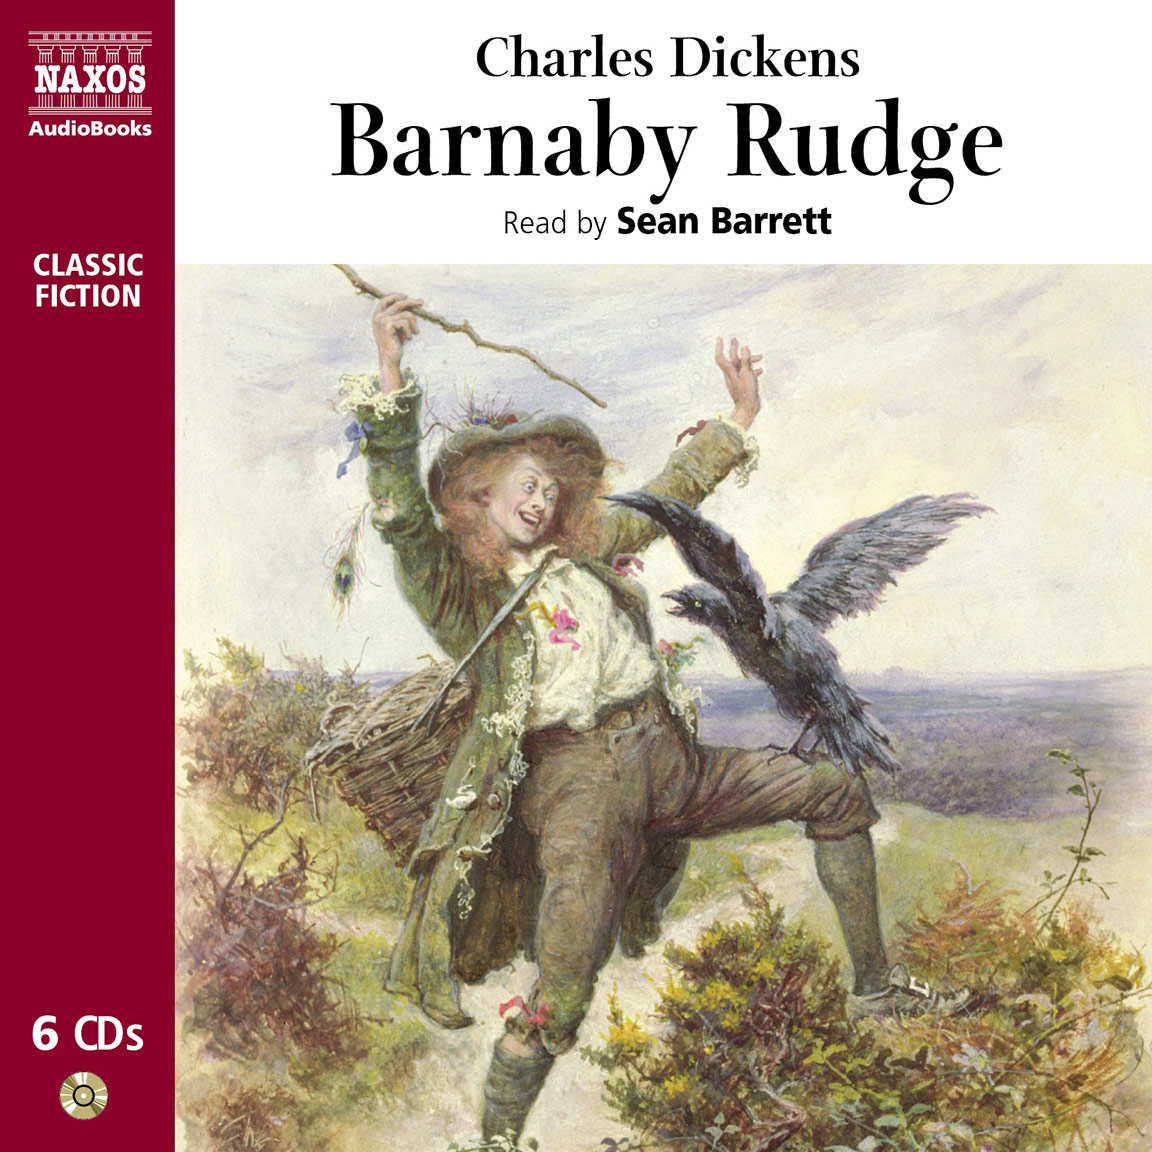 Barnaby Rudge (abridged)